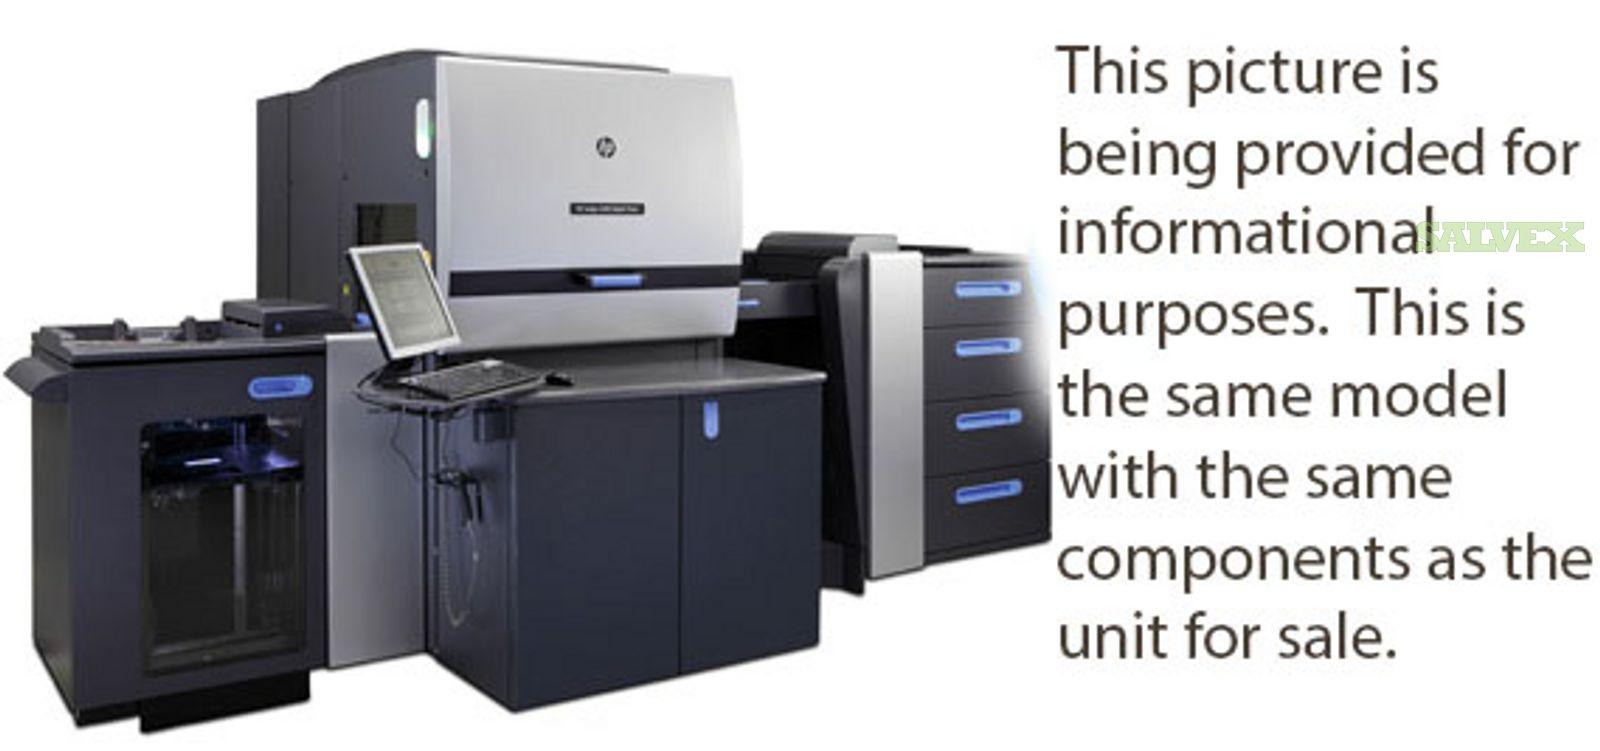 HP Indigo 5600 Digital Press  Printer